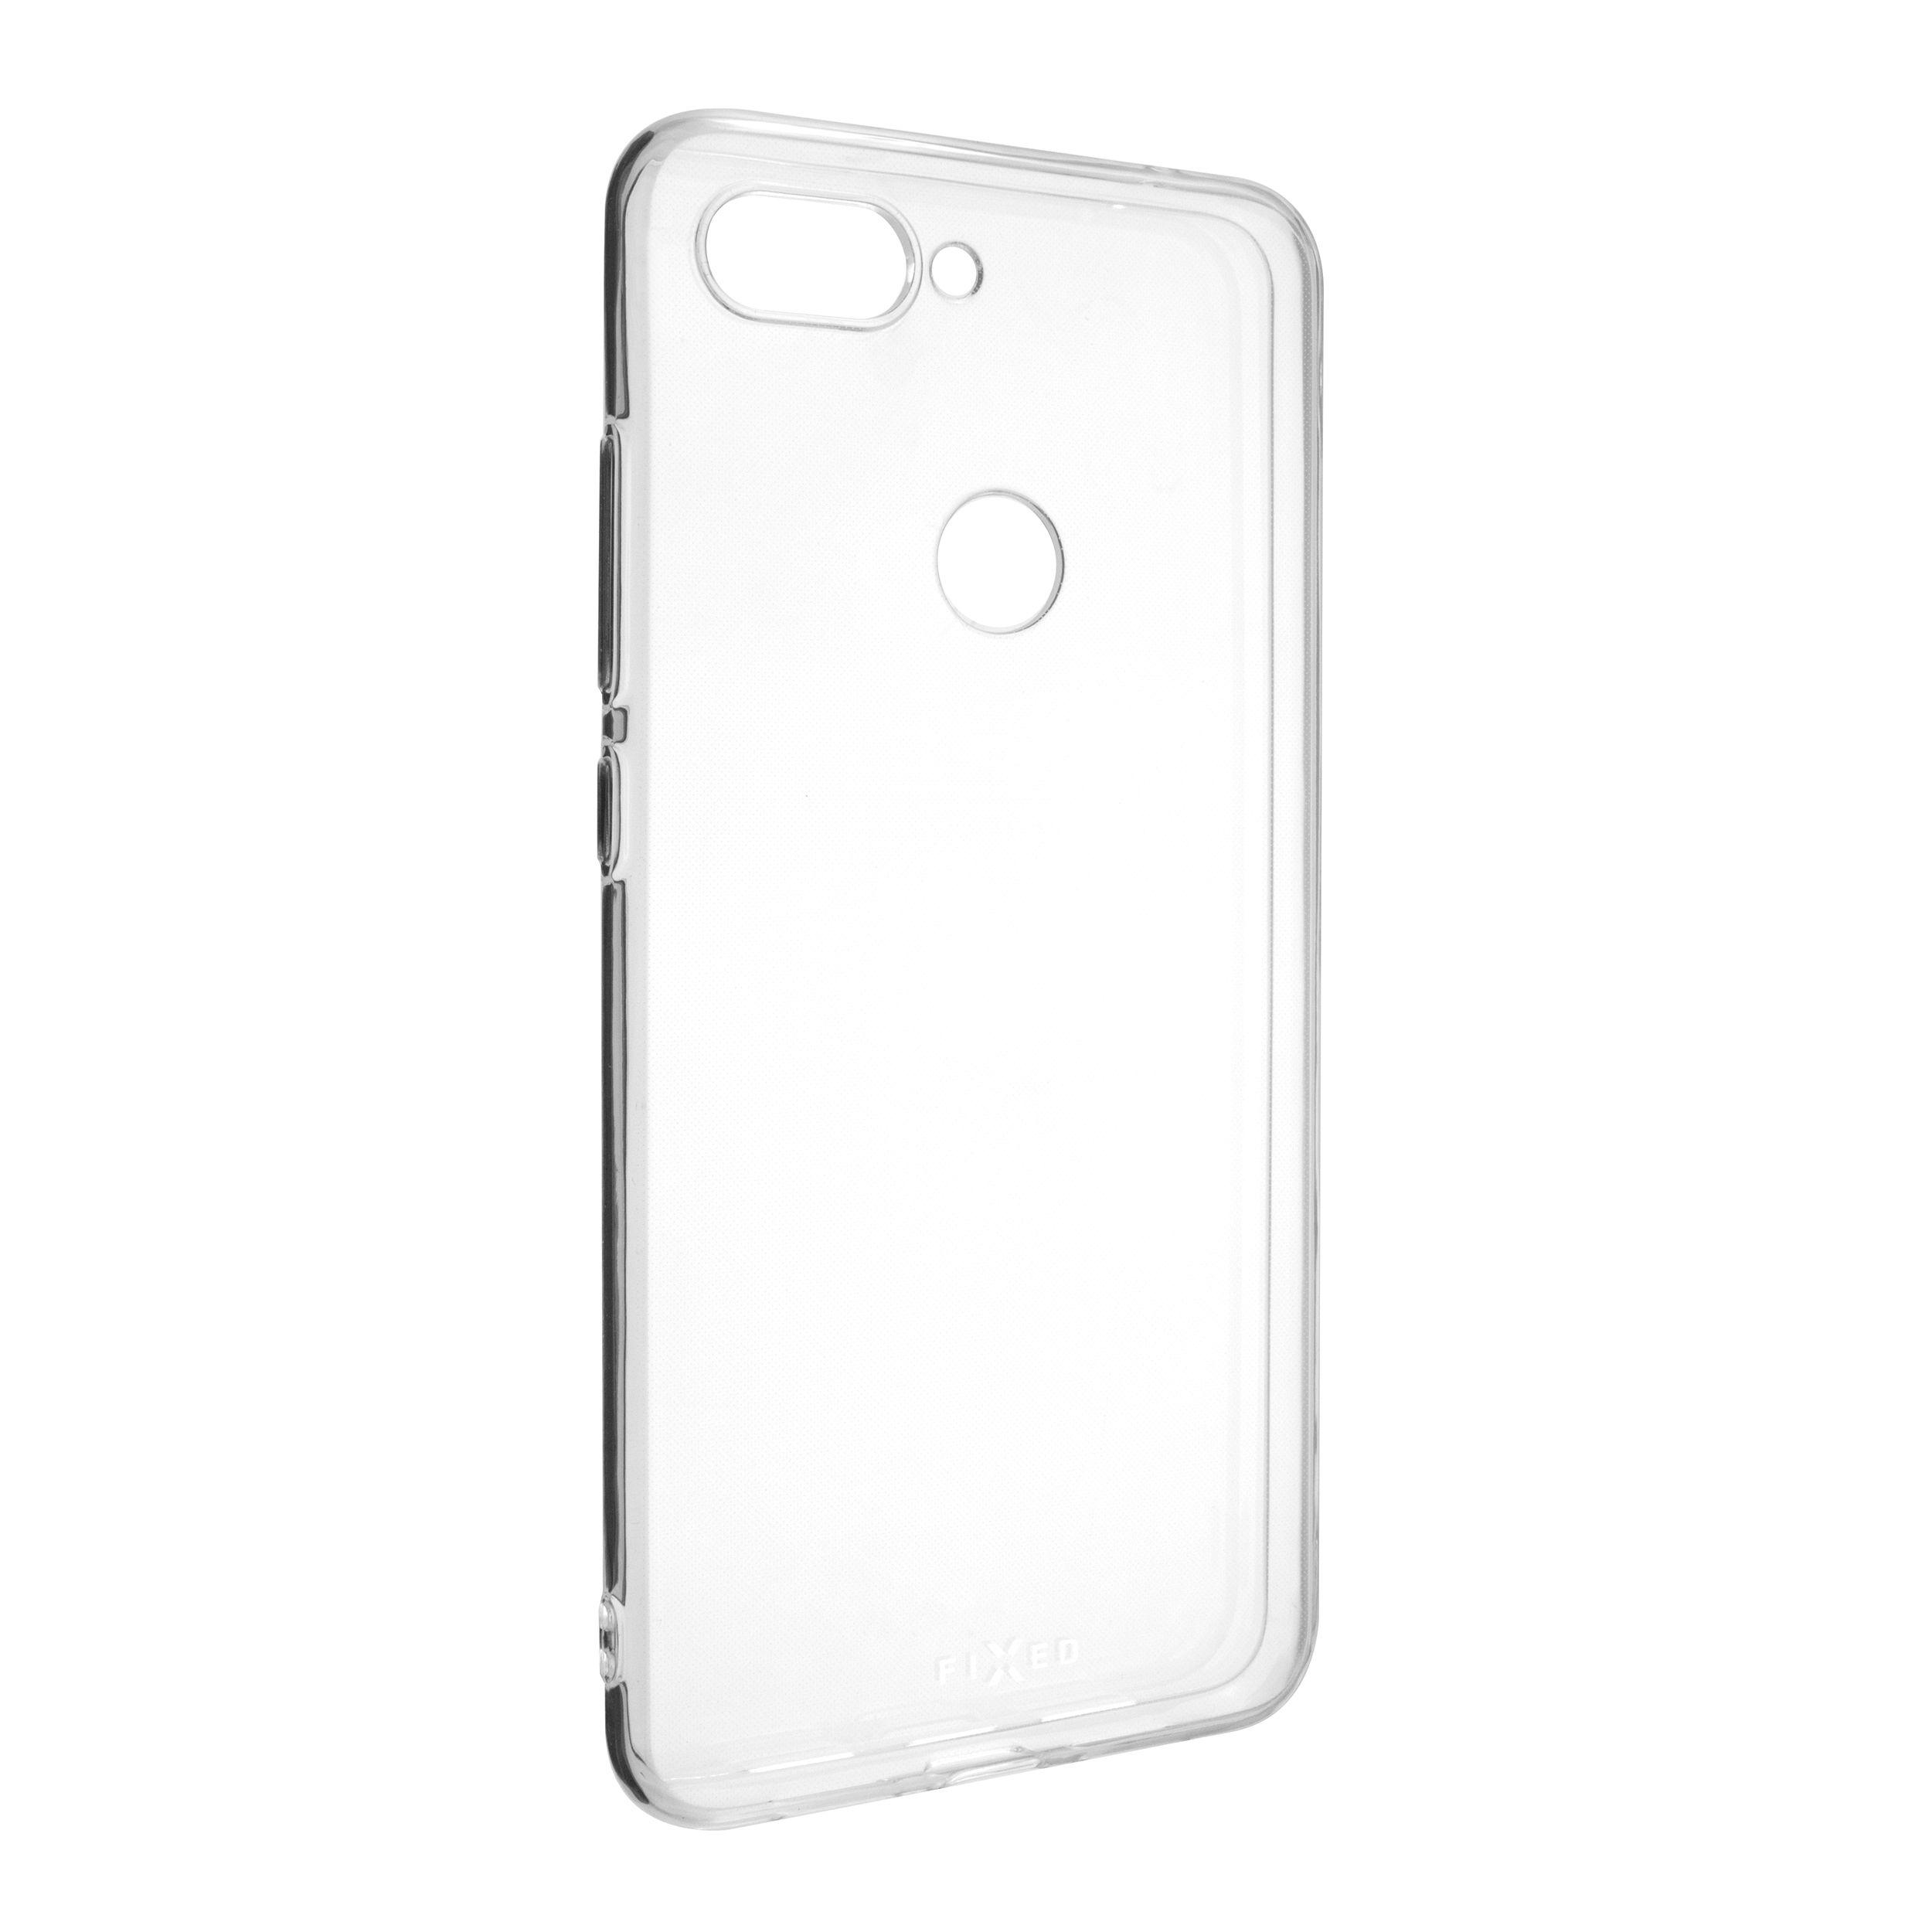 Ultratenké TPU gelové pouzdro FIXED Skin pro Xiaomi Mi8 Lite, 0,6 mm, čiré